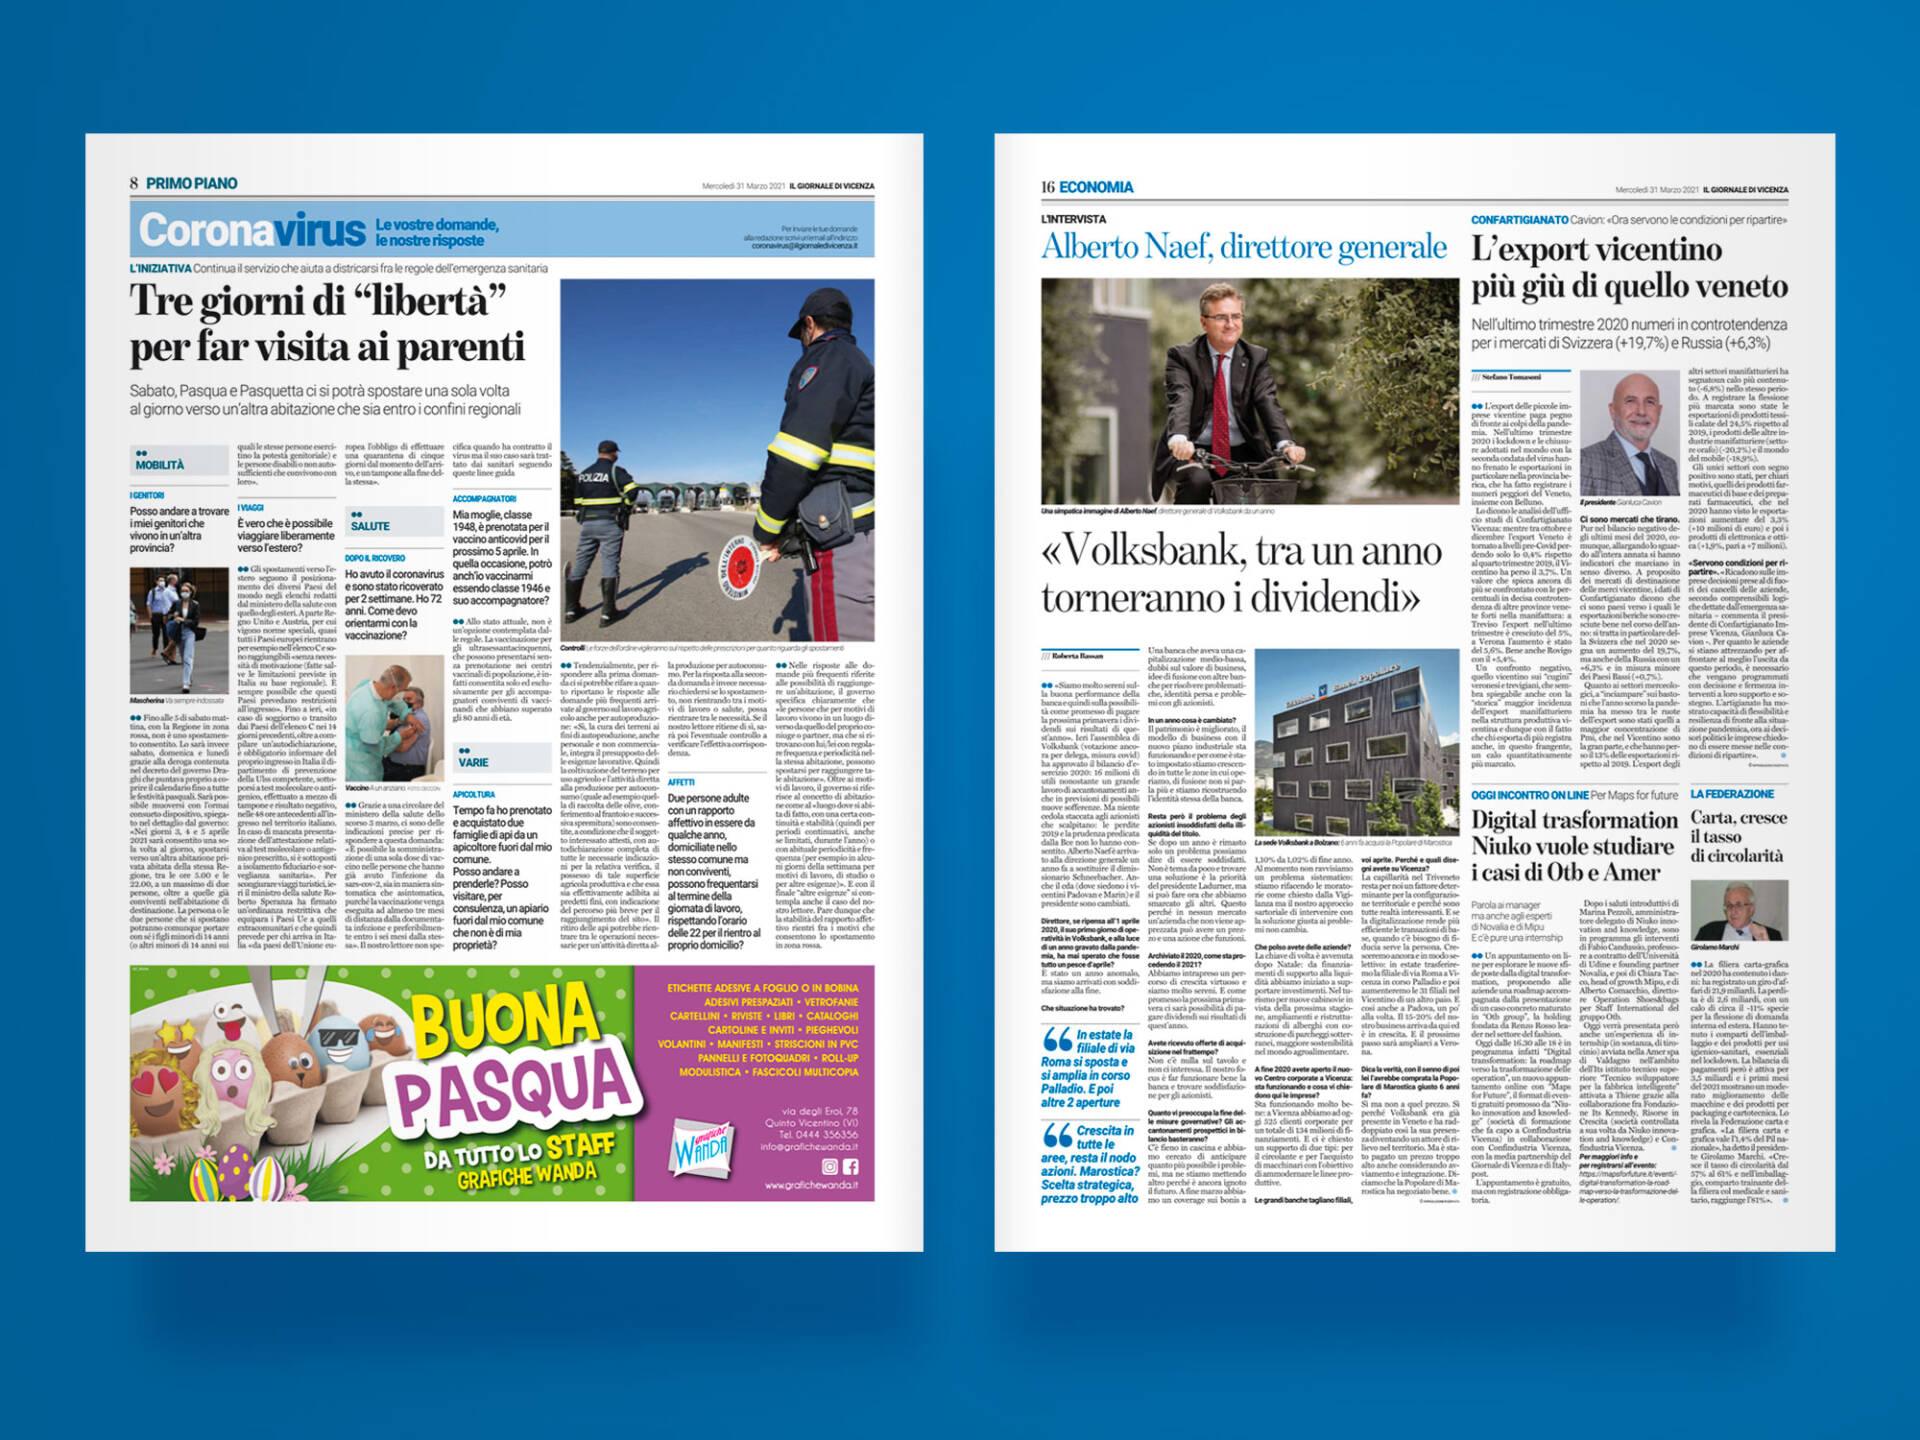 Il-Gionrale-Di-Vicenza-03-Wenceslau-News-Design-2021